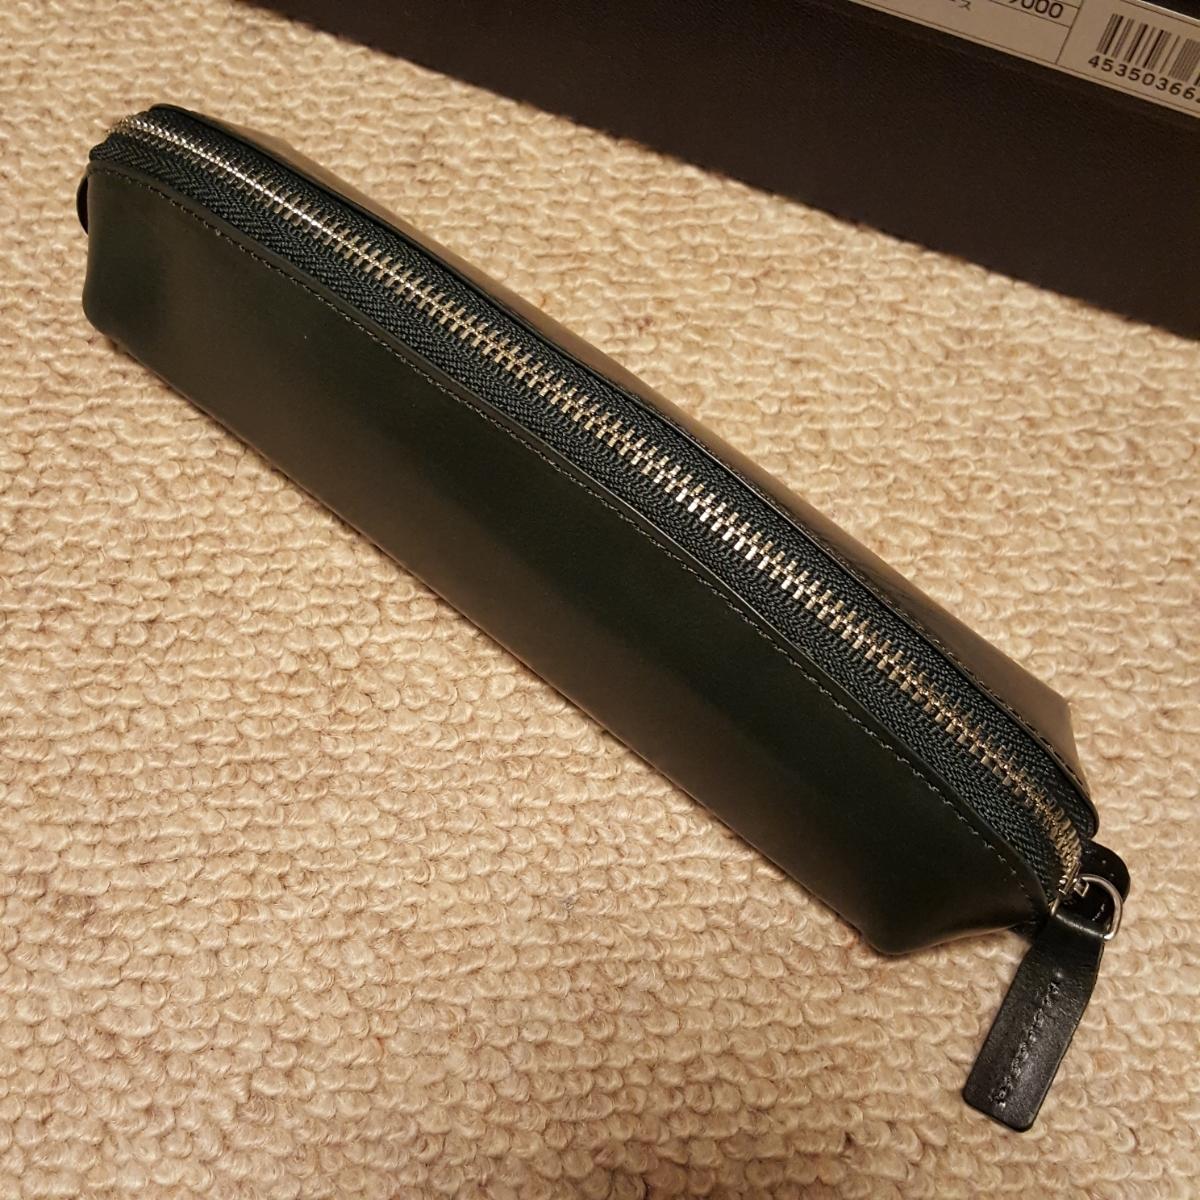 Ashford アシュフォード アルフ ペンケース グリーン 緑 筆箱 レザー ボールペン 万年筆 付属品完_画像2